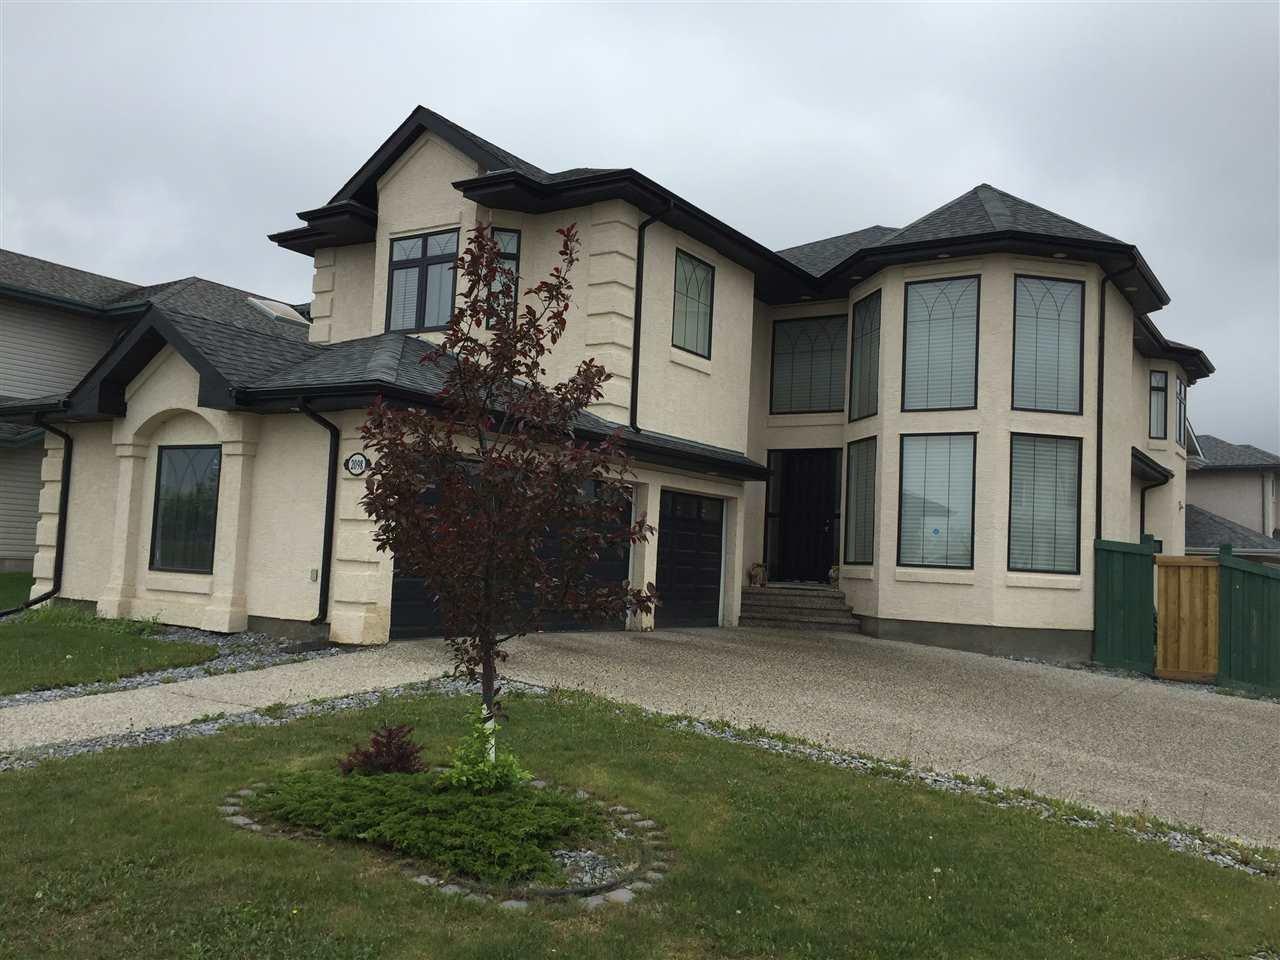 Main Photo: 2098 HADDOW Drive in Edmonton: Zone 14 House for sale : MLS®# E4123399